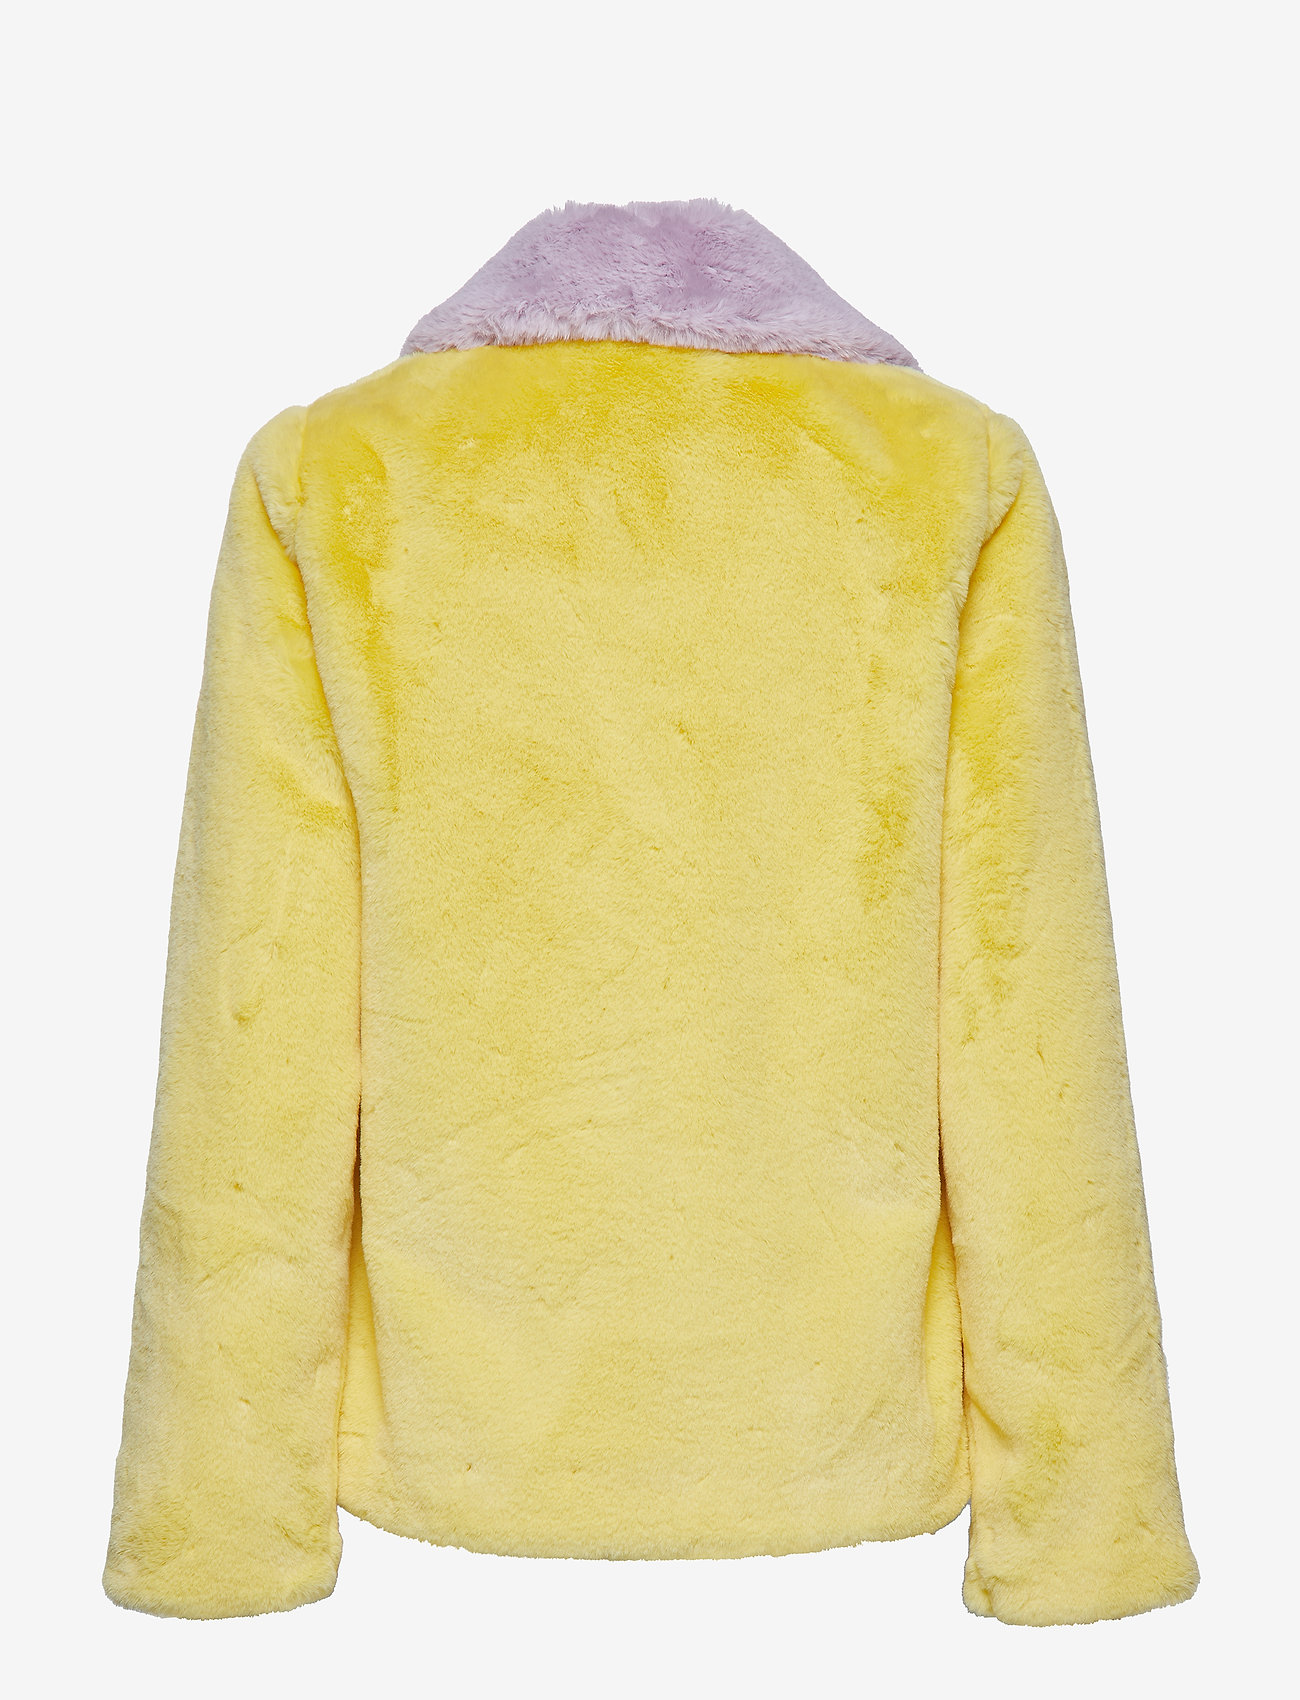 Mariska Jacket (Pale Yellow/pale Iris) - Stand Studio kQOJMr